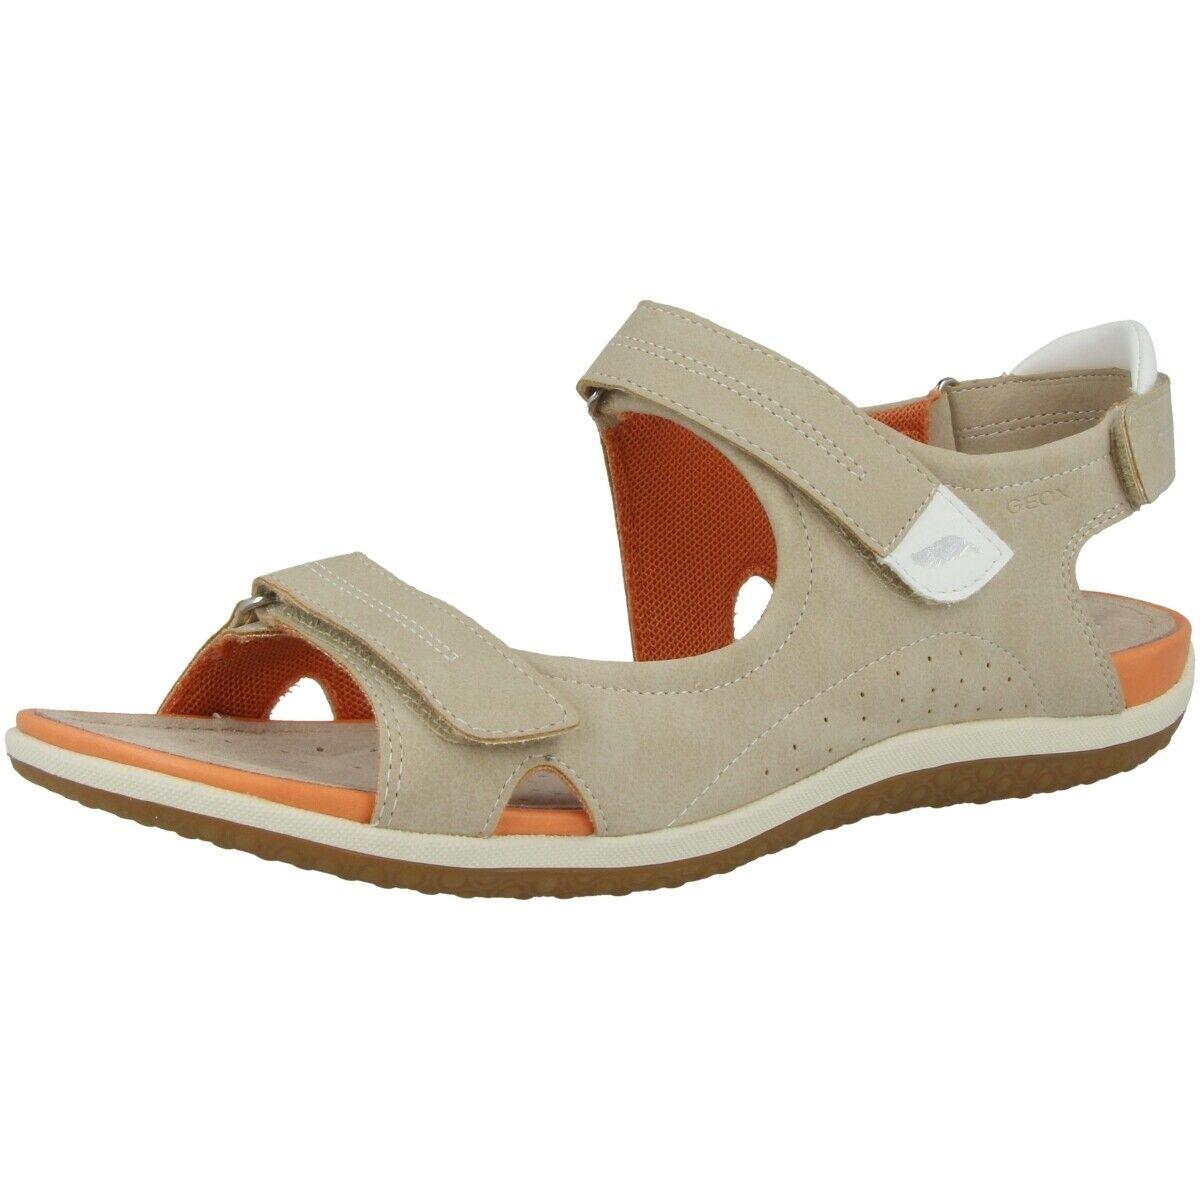 Geox d arena. vega a zapatos señora sandalias outdoor sandalias d52r6a000ekc5000